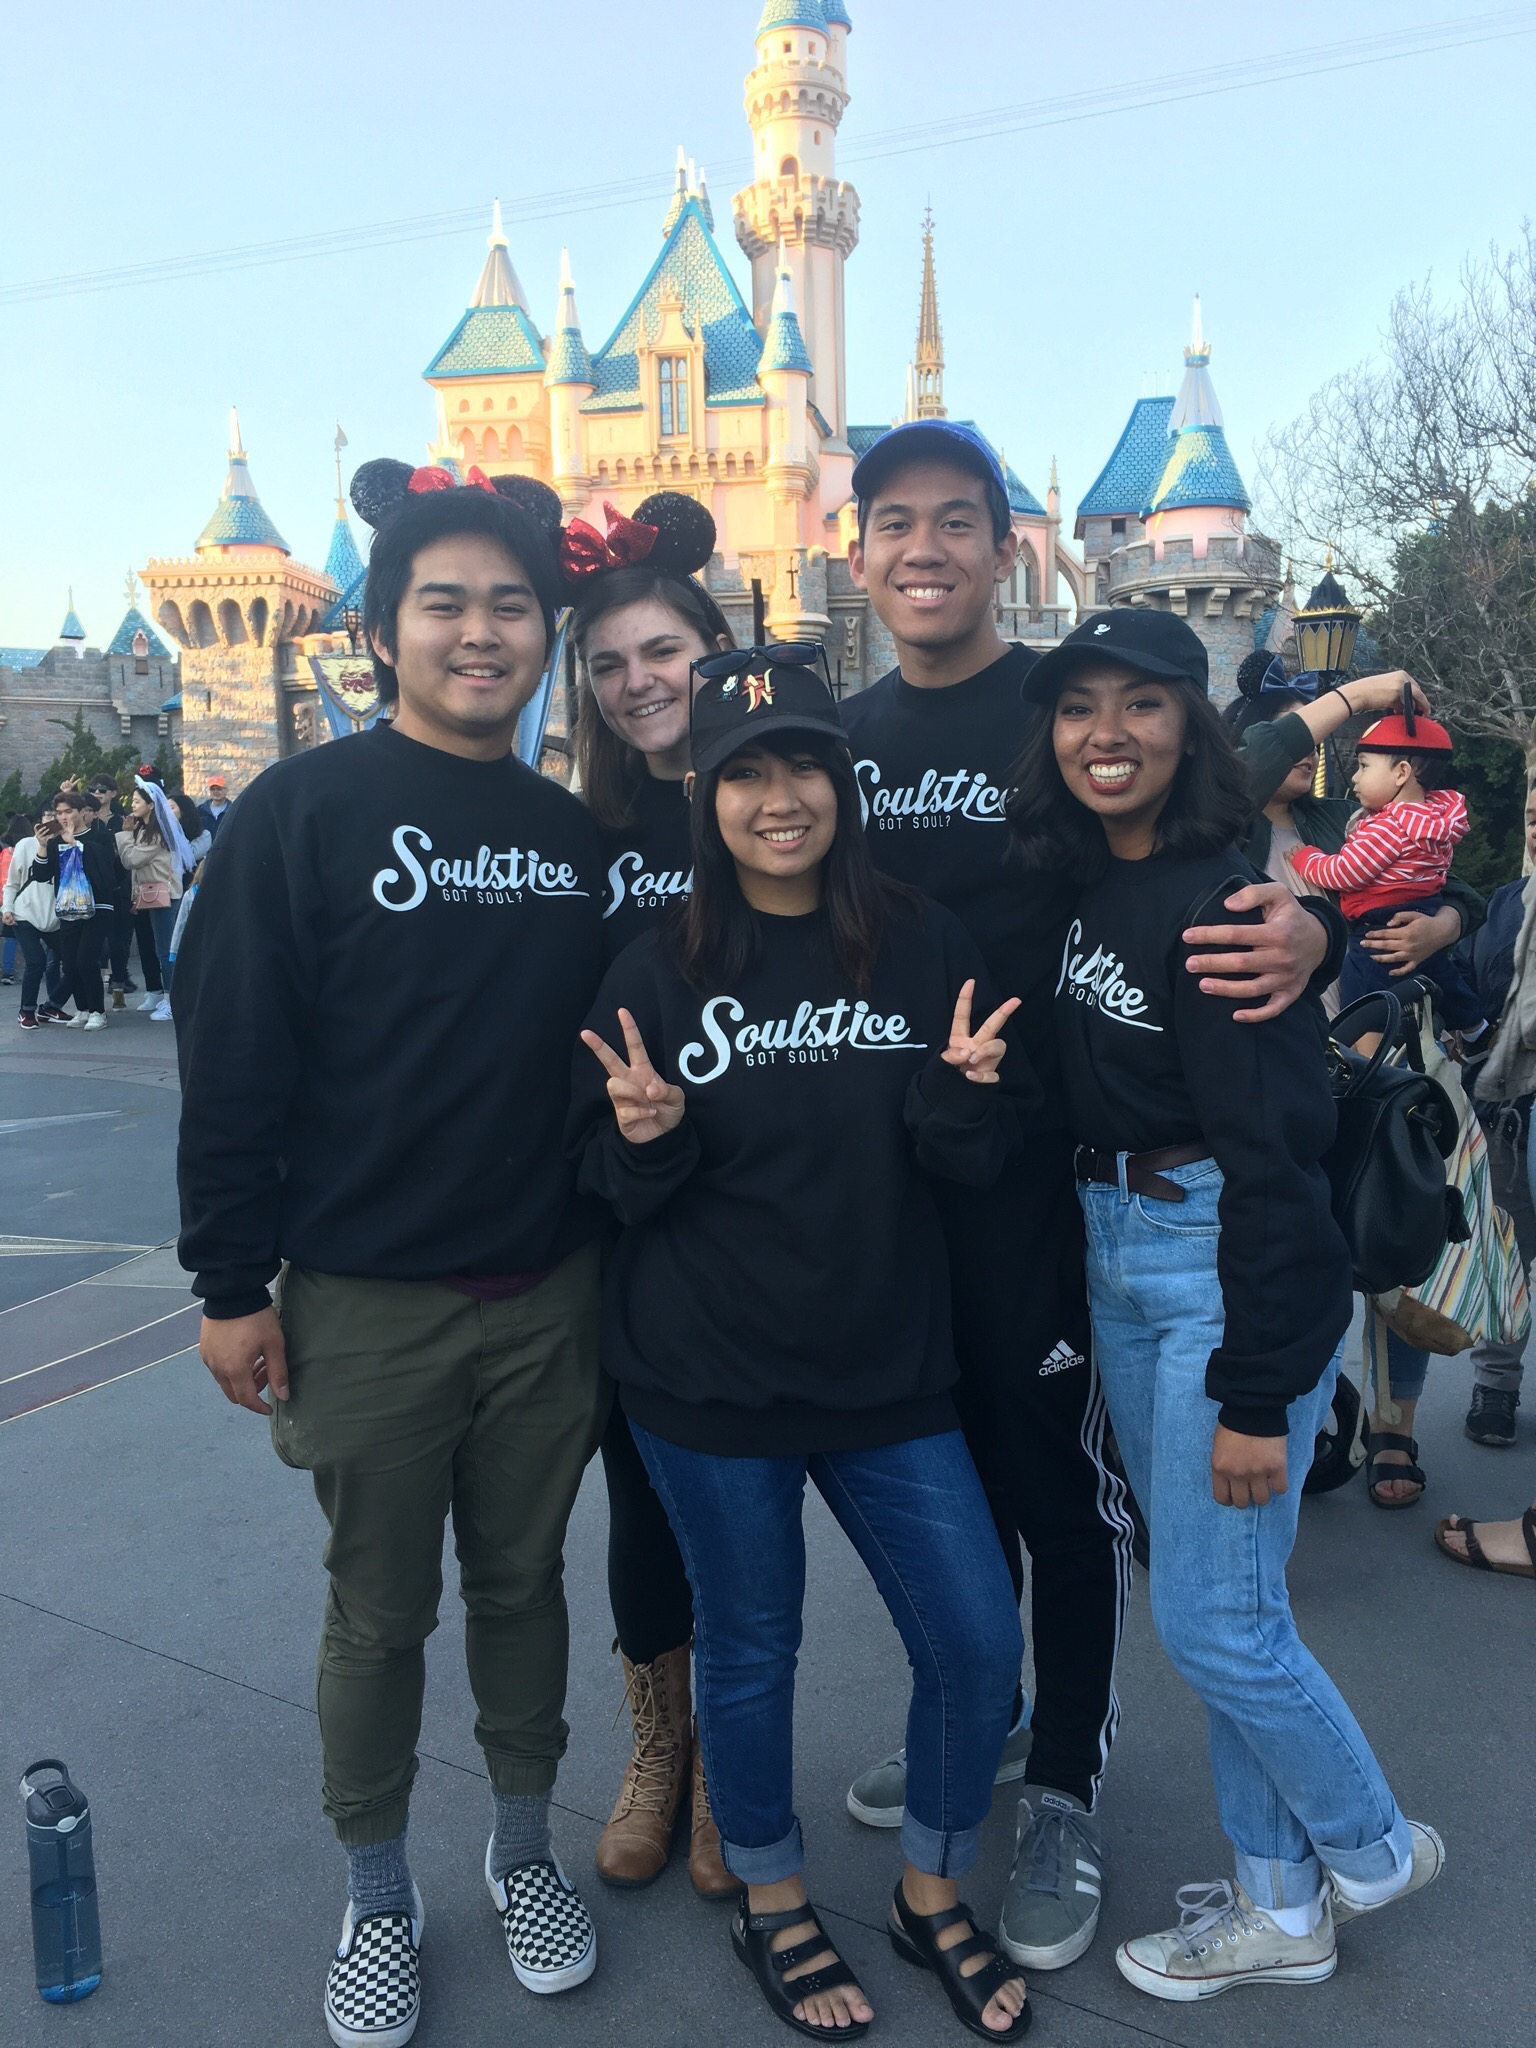 Soulstice League at Disneyland.